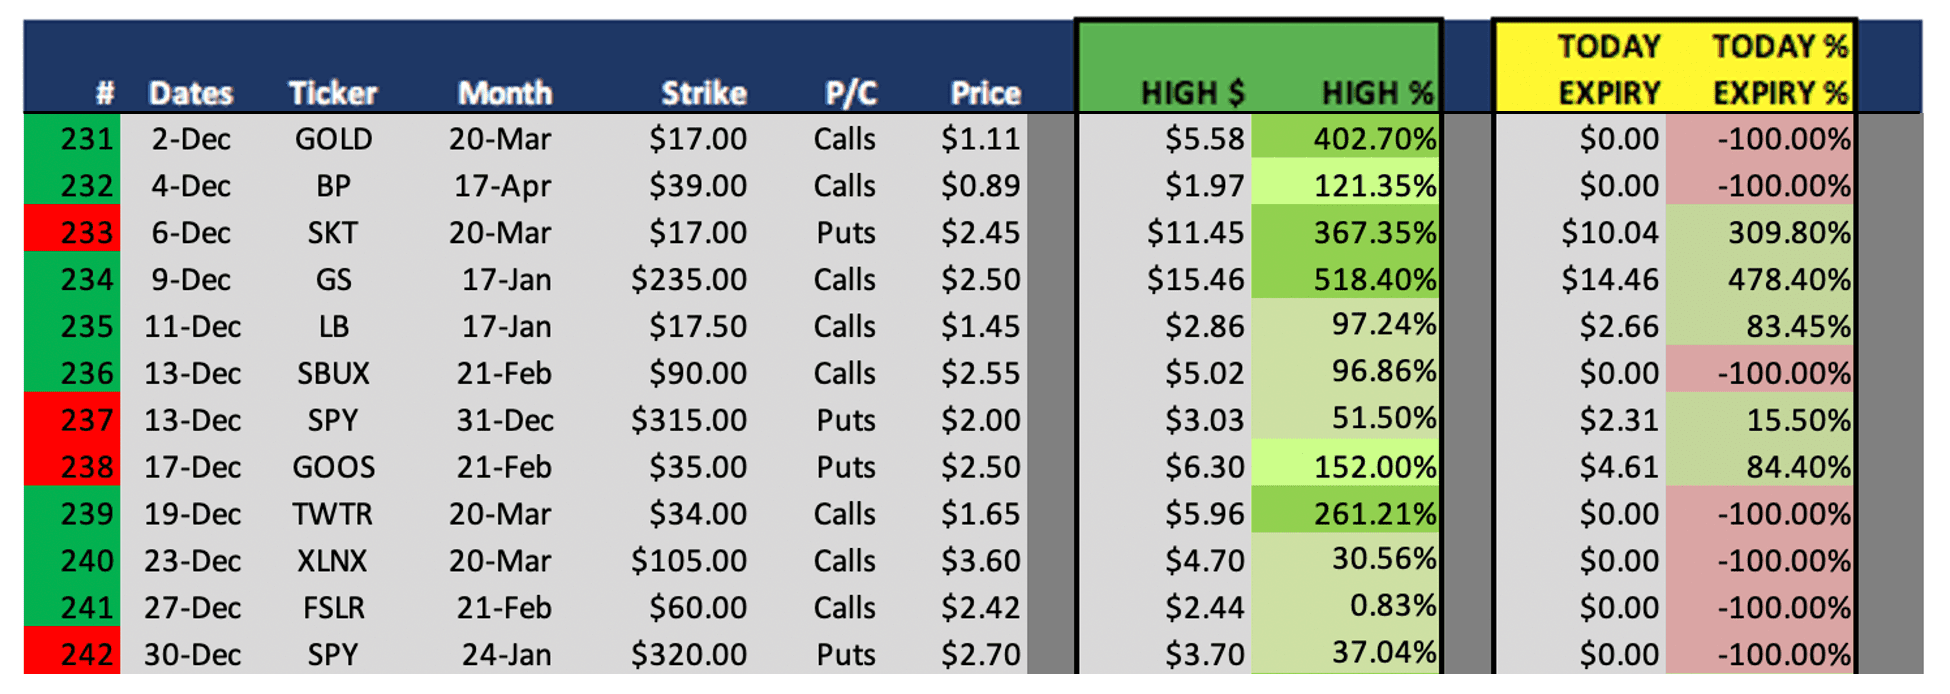 Best Options Trading Signals Winning Picks Weekly Results on December 30 231 thru 242